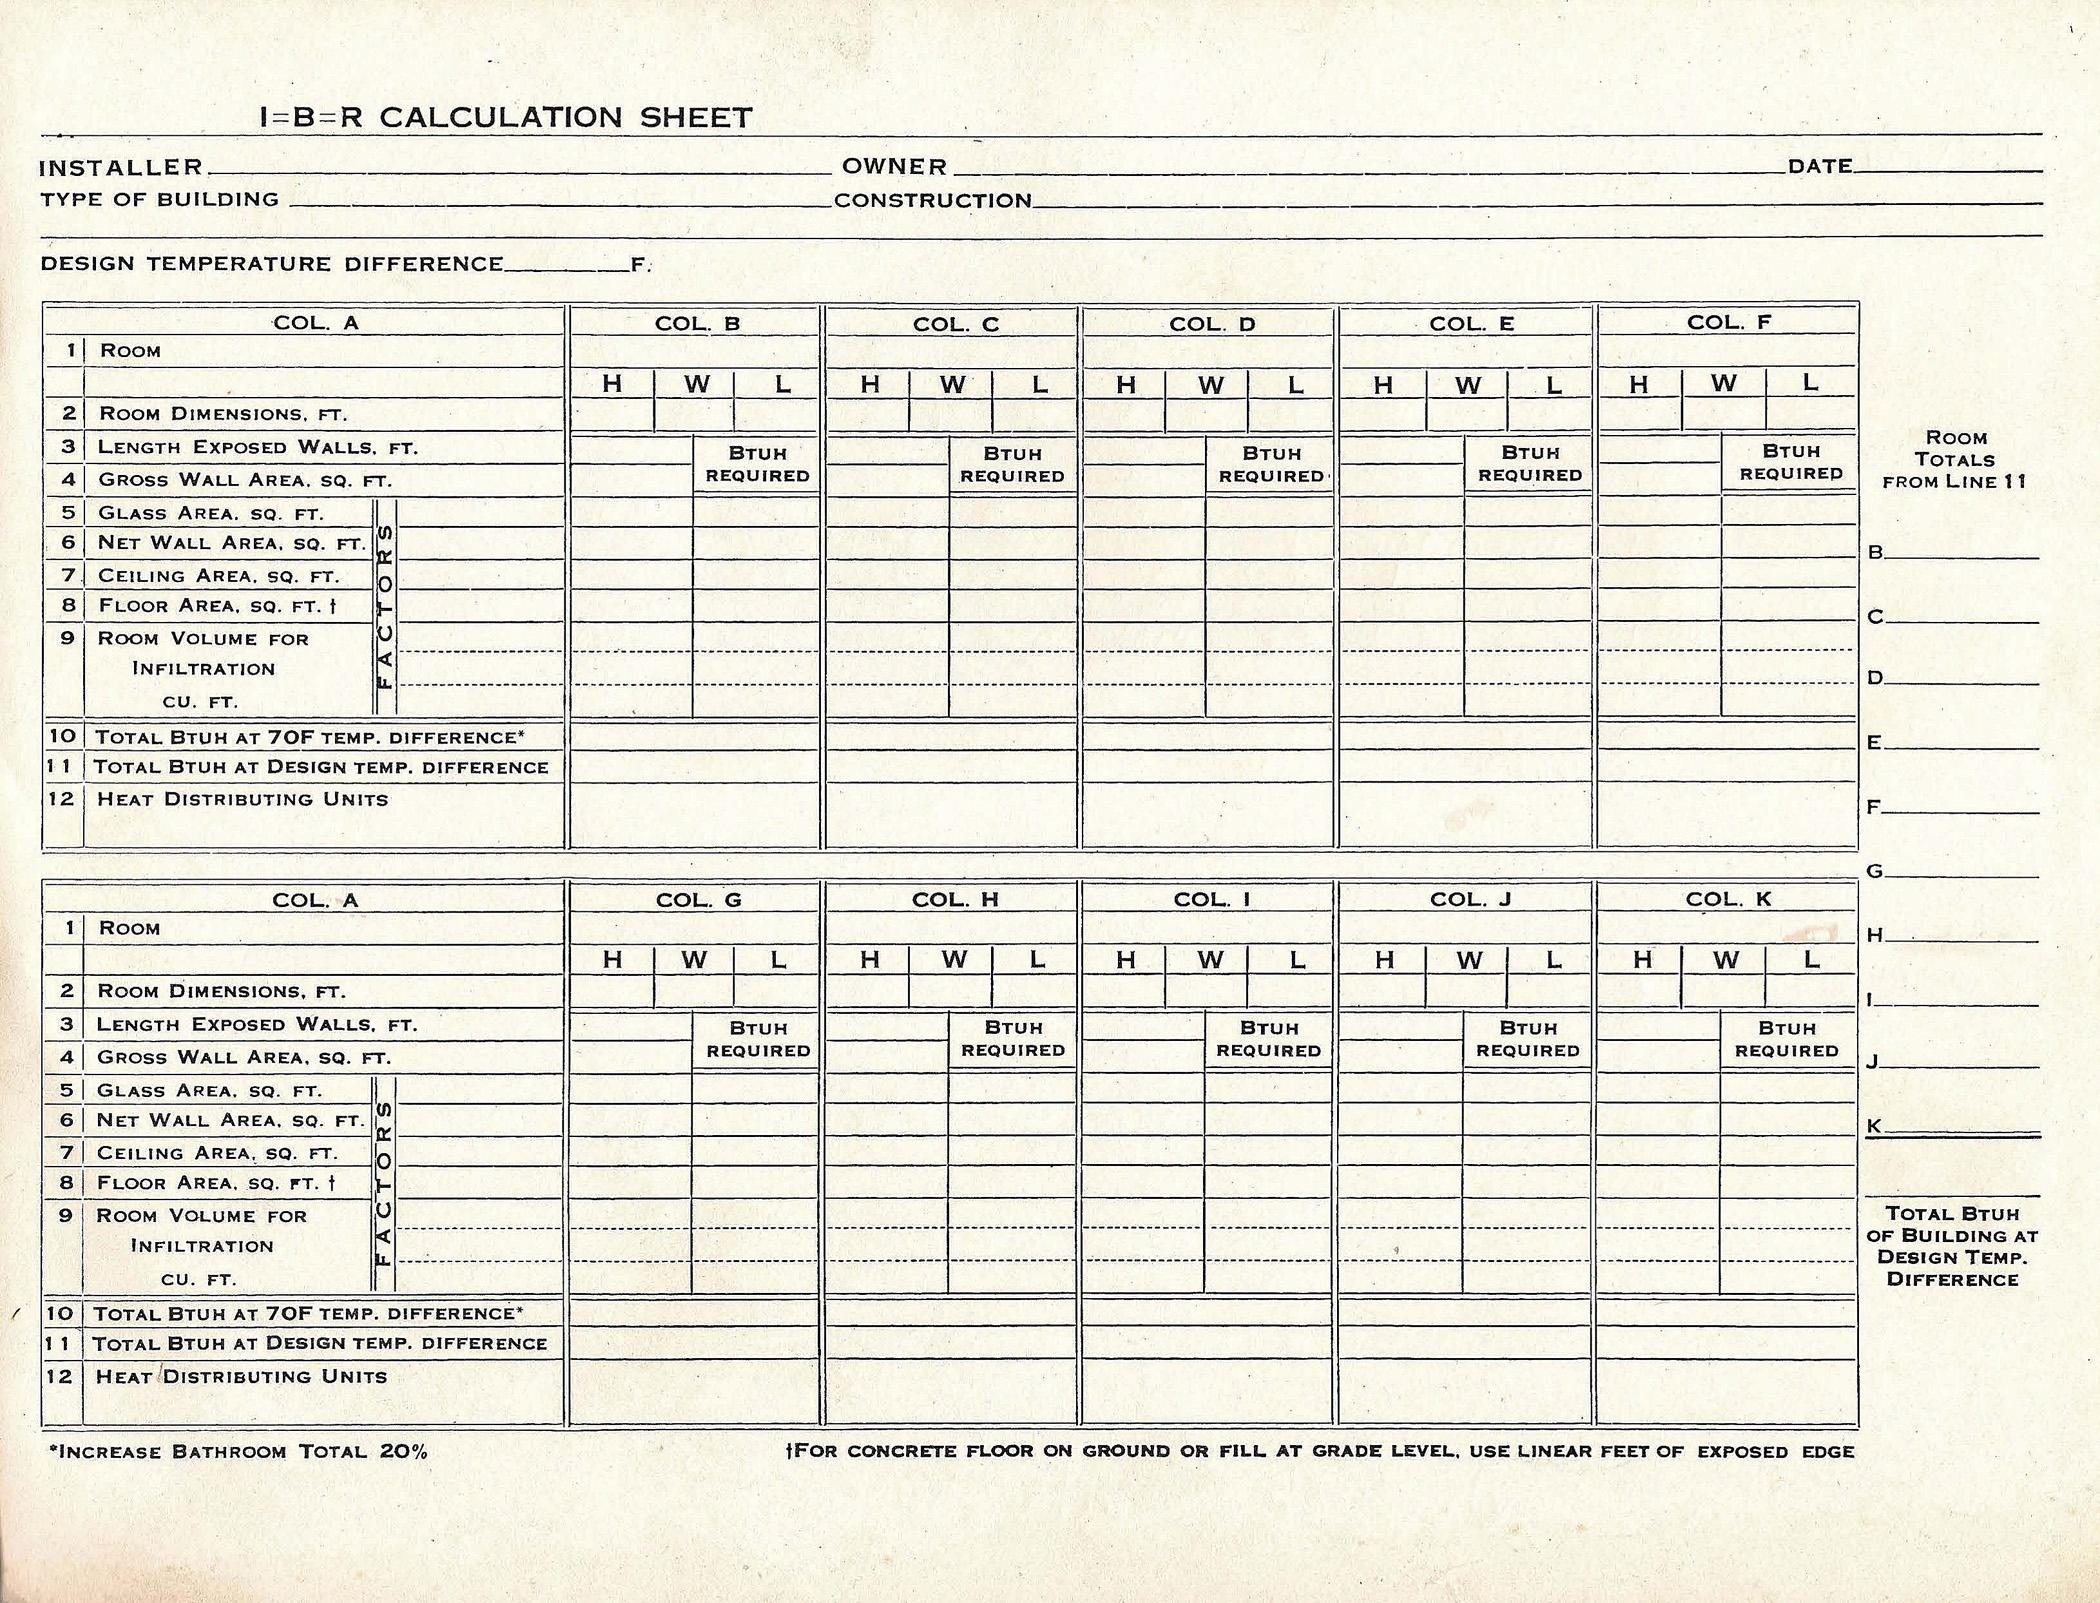 Electrical Load Analysis Spreadsheet Regarding Example Of Electrical Load Calculator Spreadsheet When Do I Need